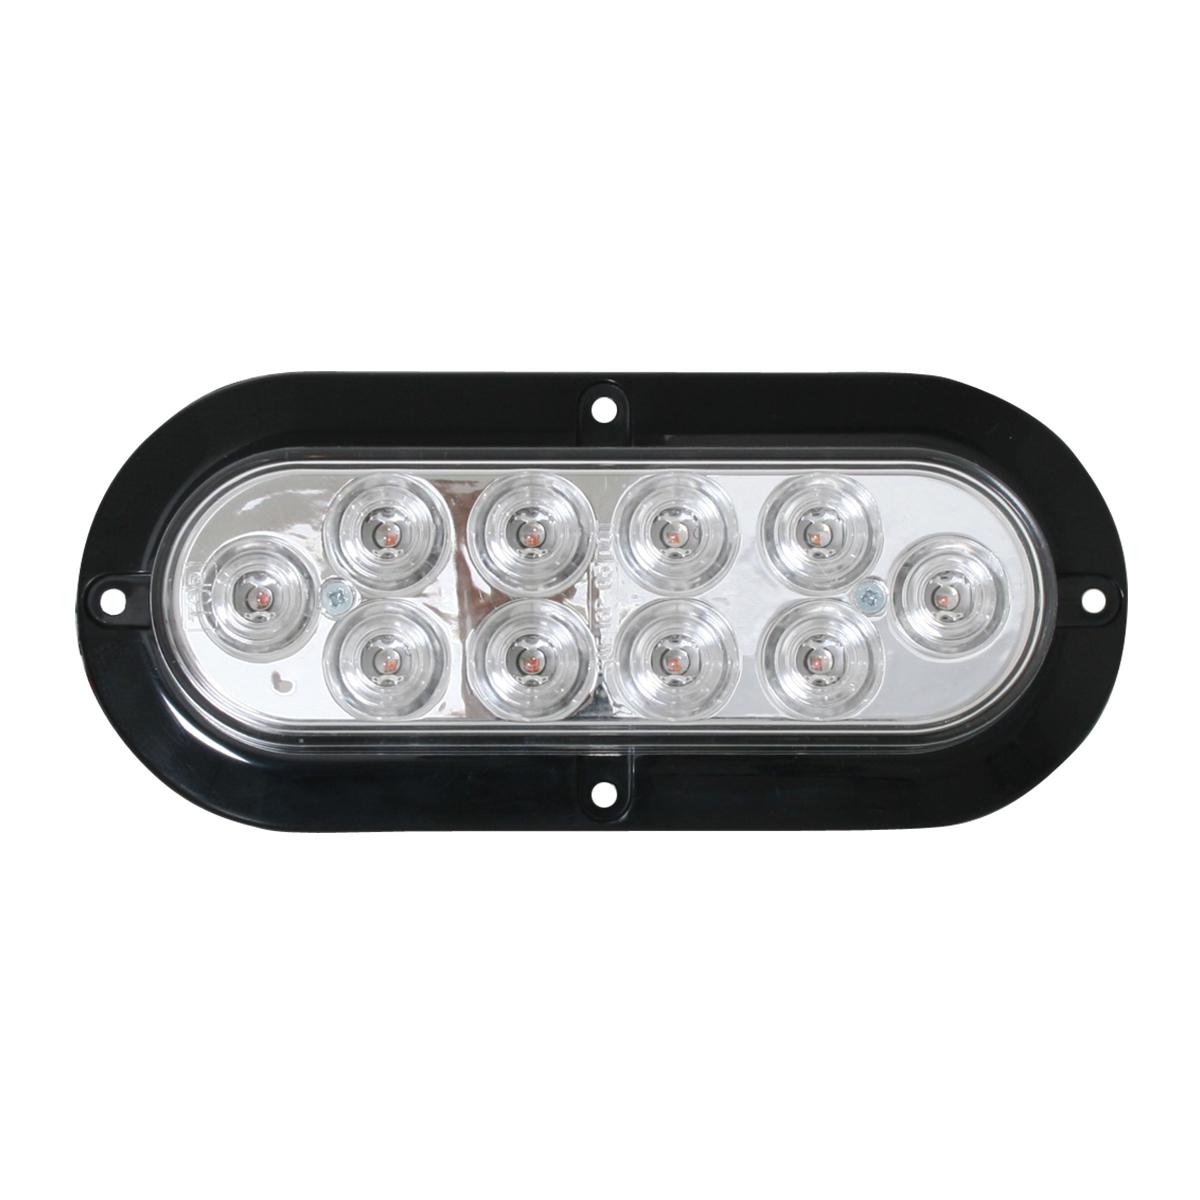 76871 Surface Mount Oval Mega 10 Plus LED Light